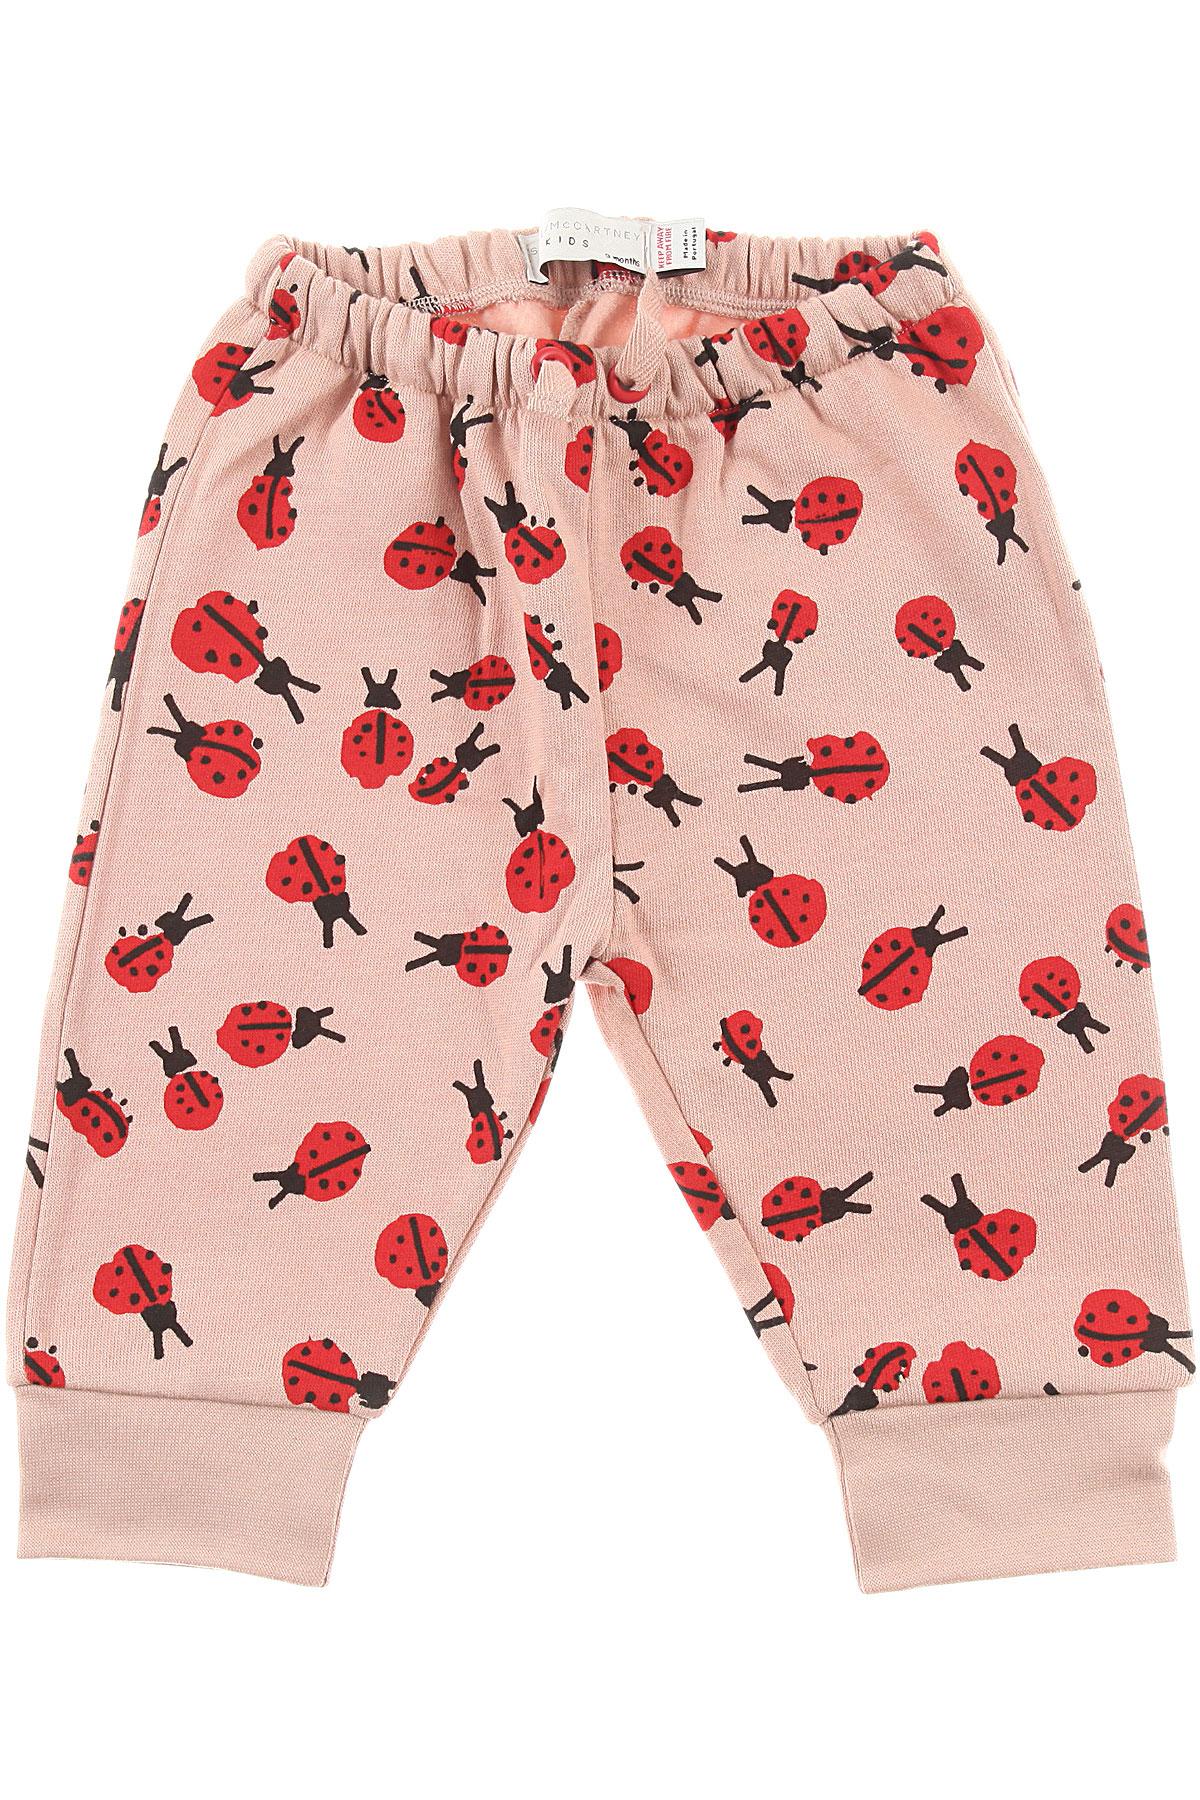 Image of Stella McCartney Baby Sweatpants for Girls, Pink, Cotton, 2017, 12M 18M 2Y 3M 3Y 6M 9M